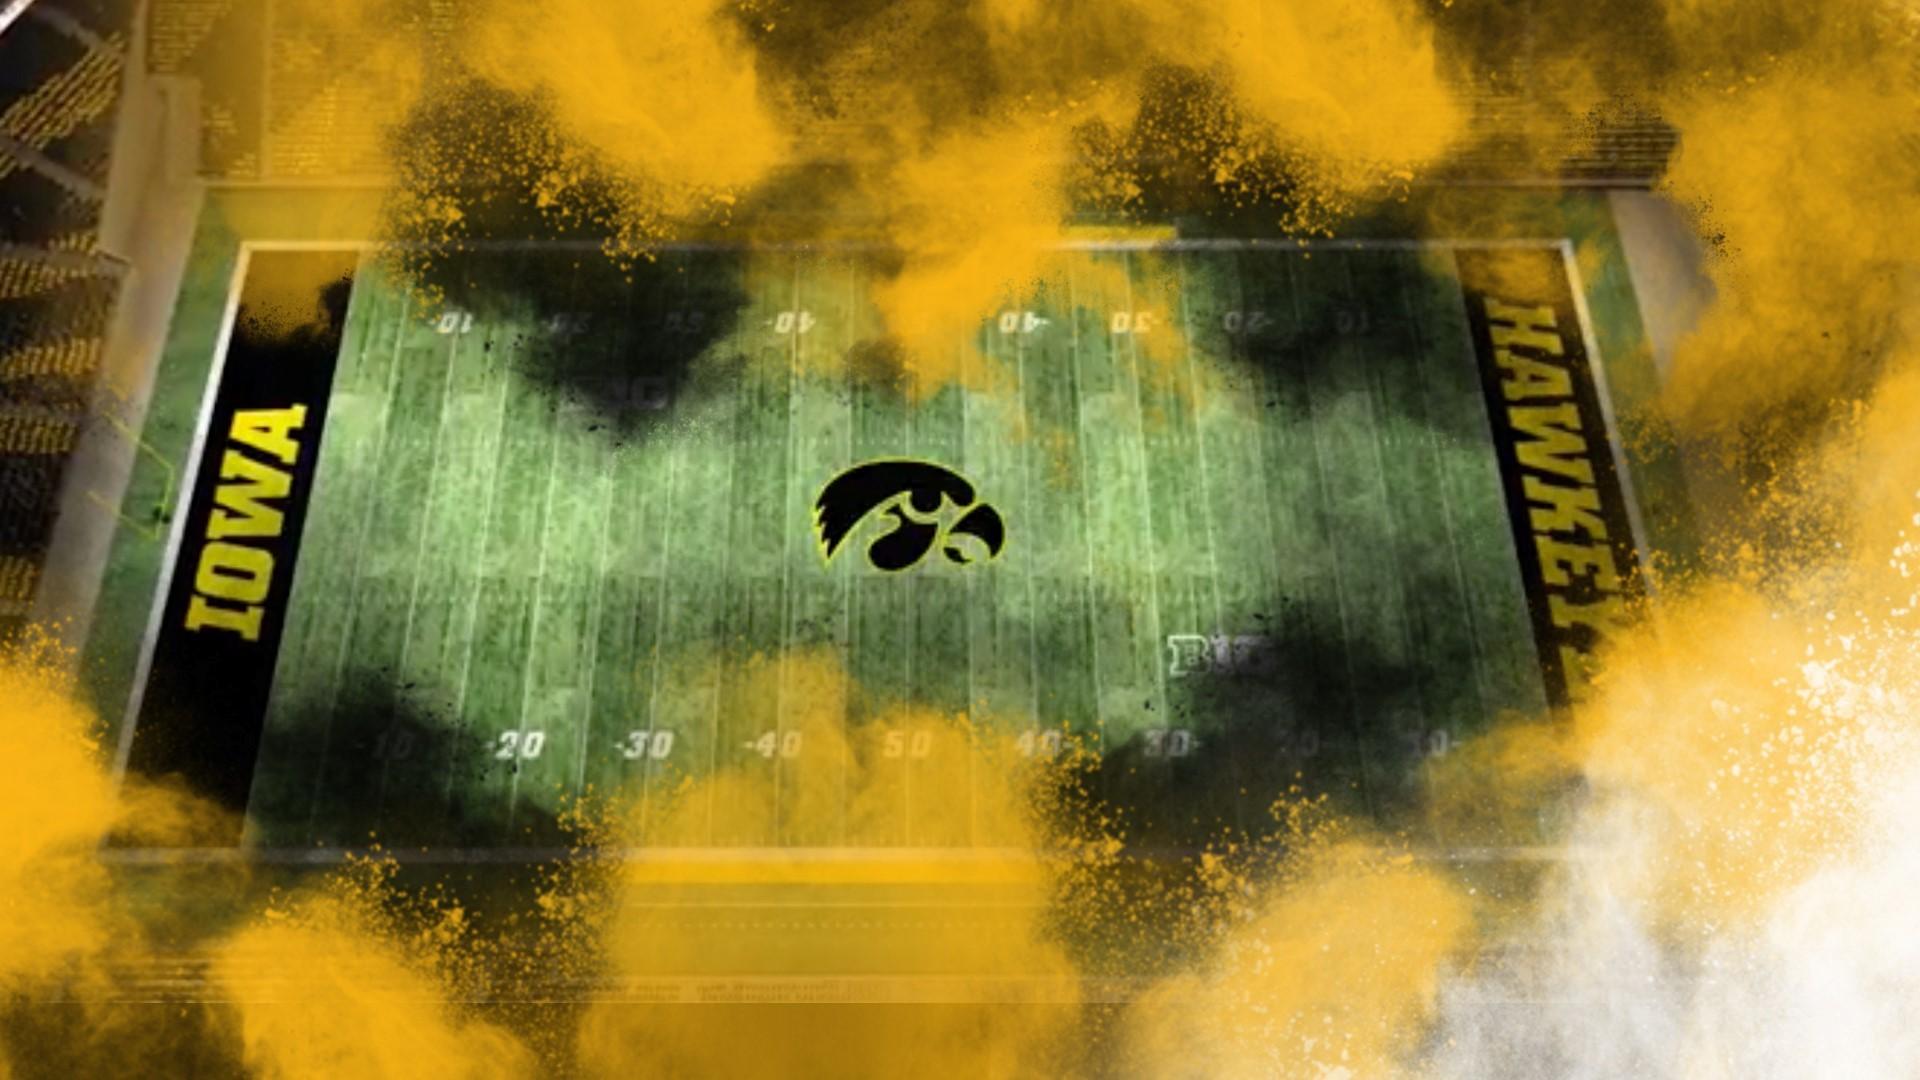 Iowa Hawkeyes Football Stadium Wallpaper